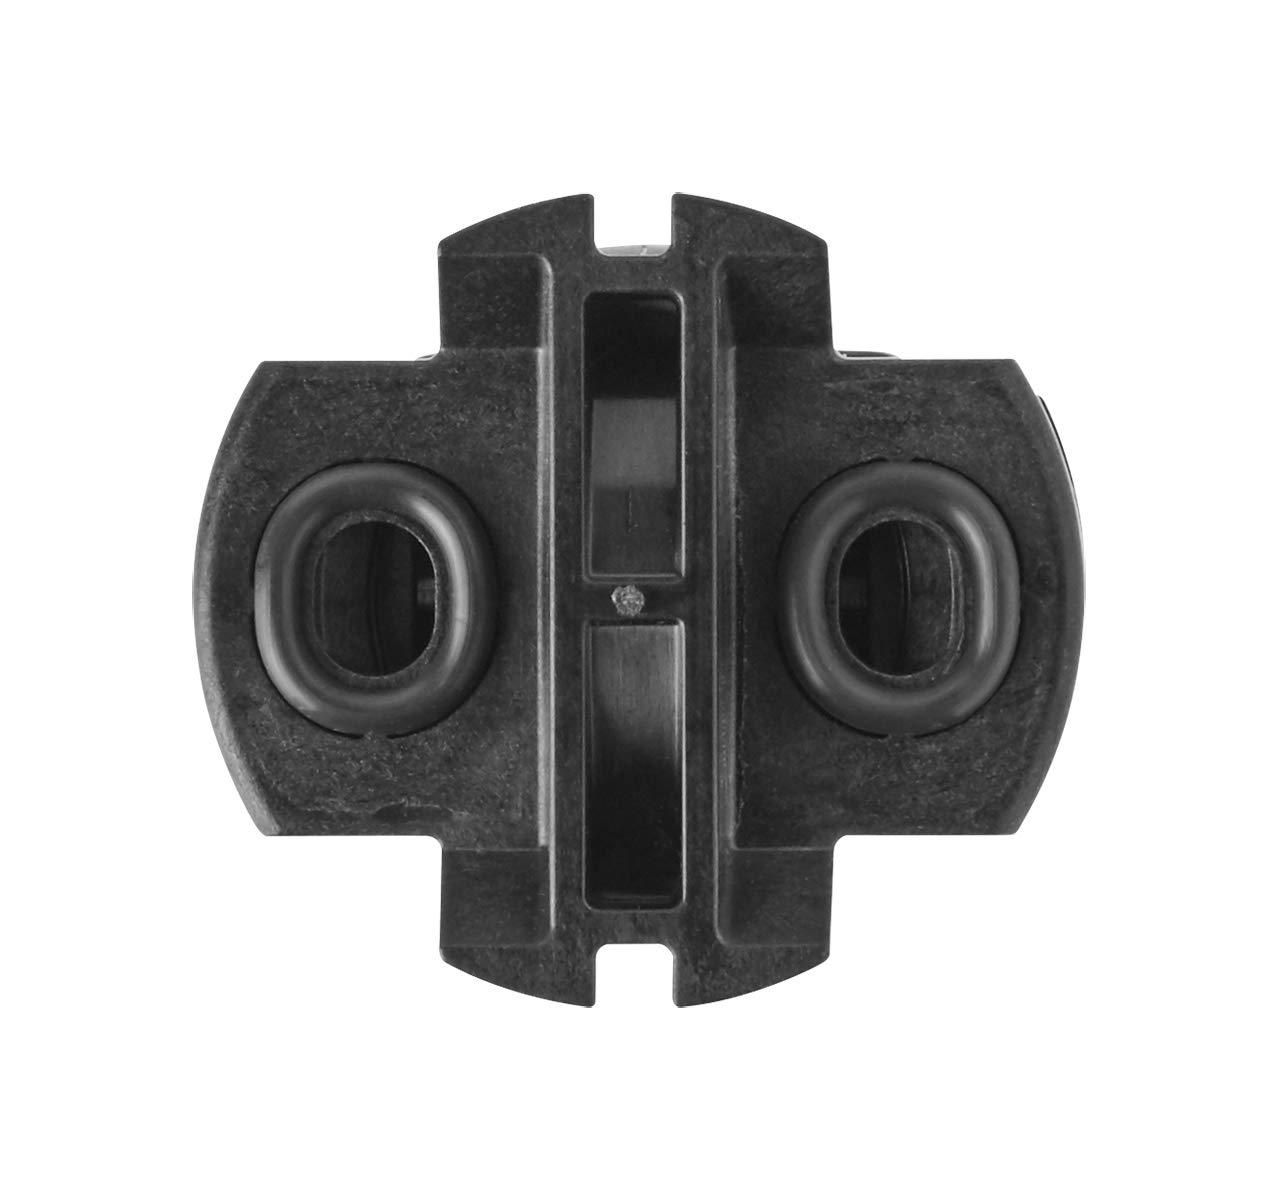 Kohler Part GP800820 Rite-Temp Pressure-Balancing Unit Cartridge, Black by Kohler (Image #4)